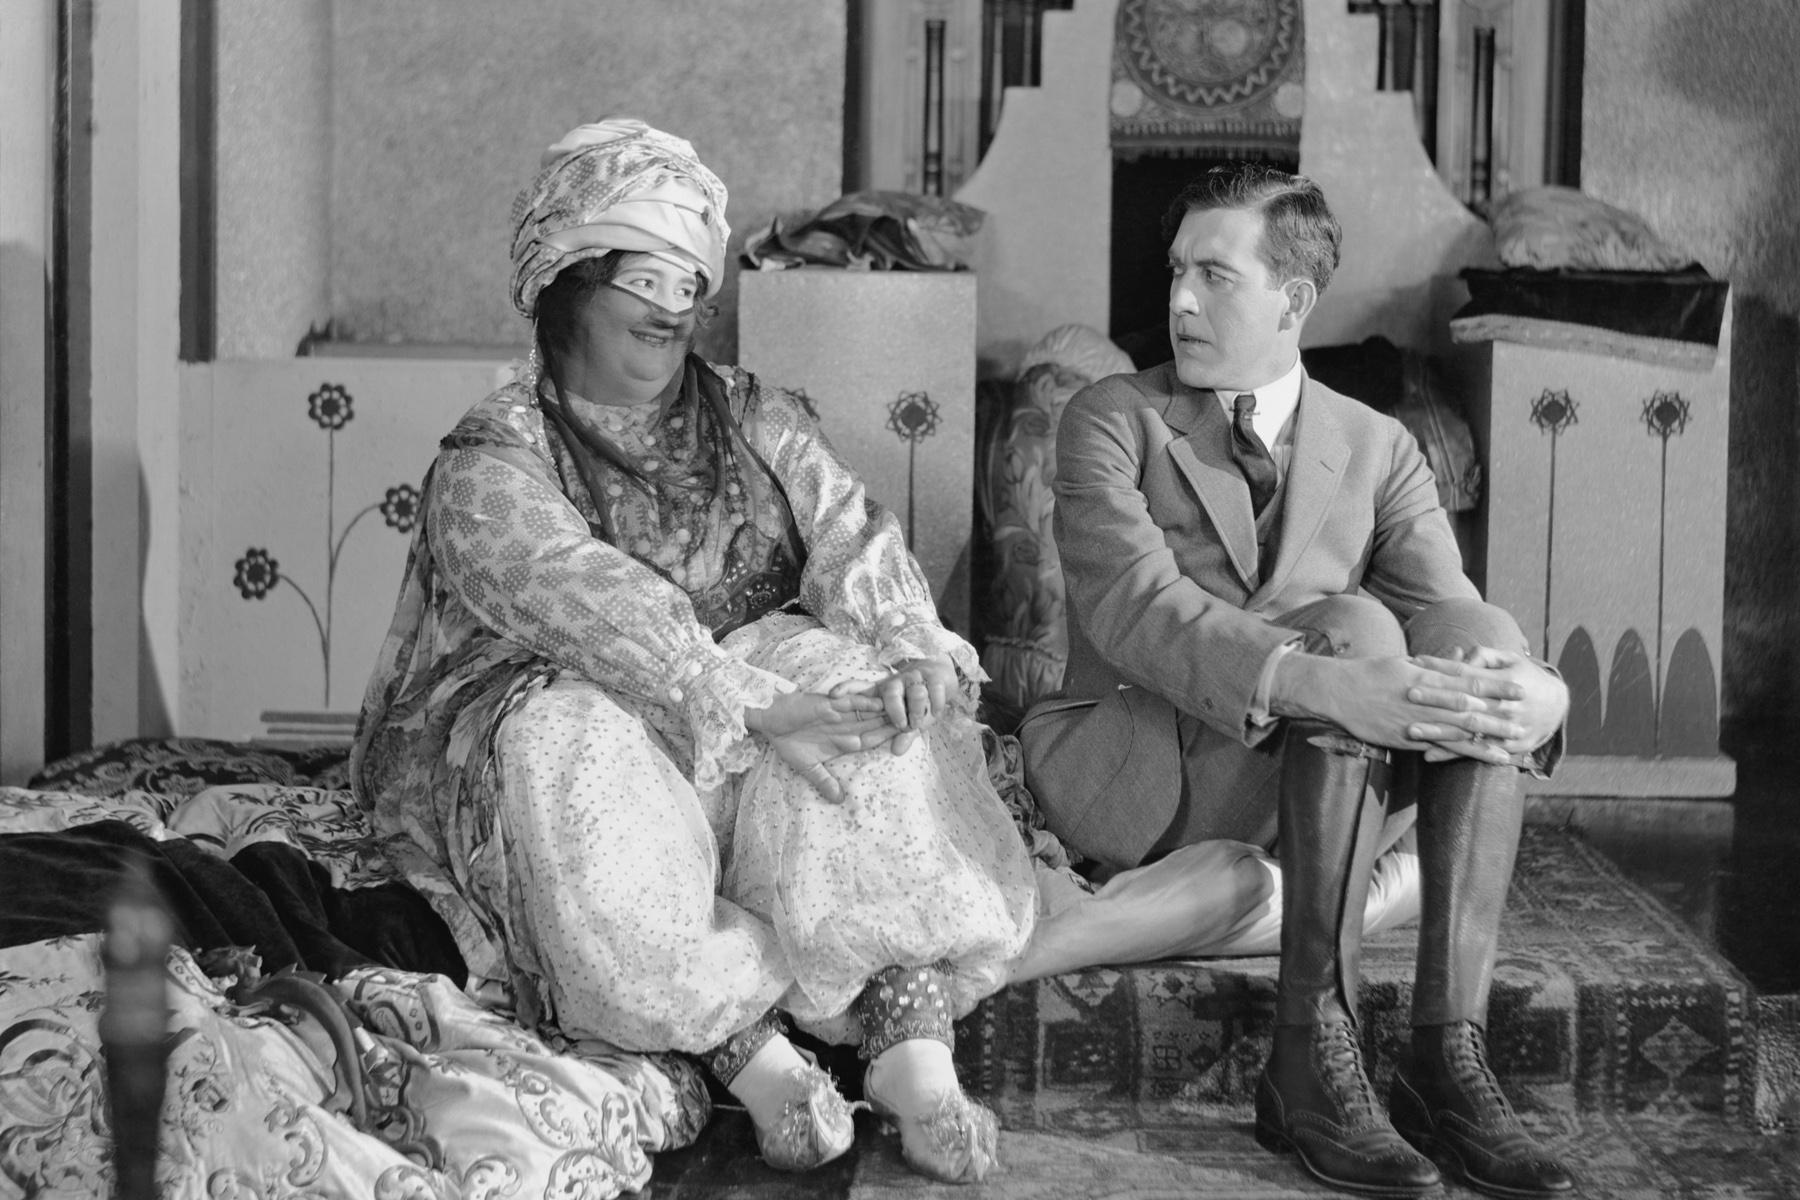 Woman and man having a misunderstanding